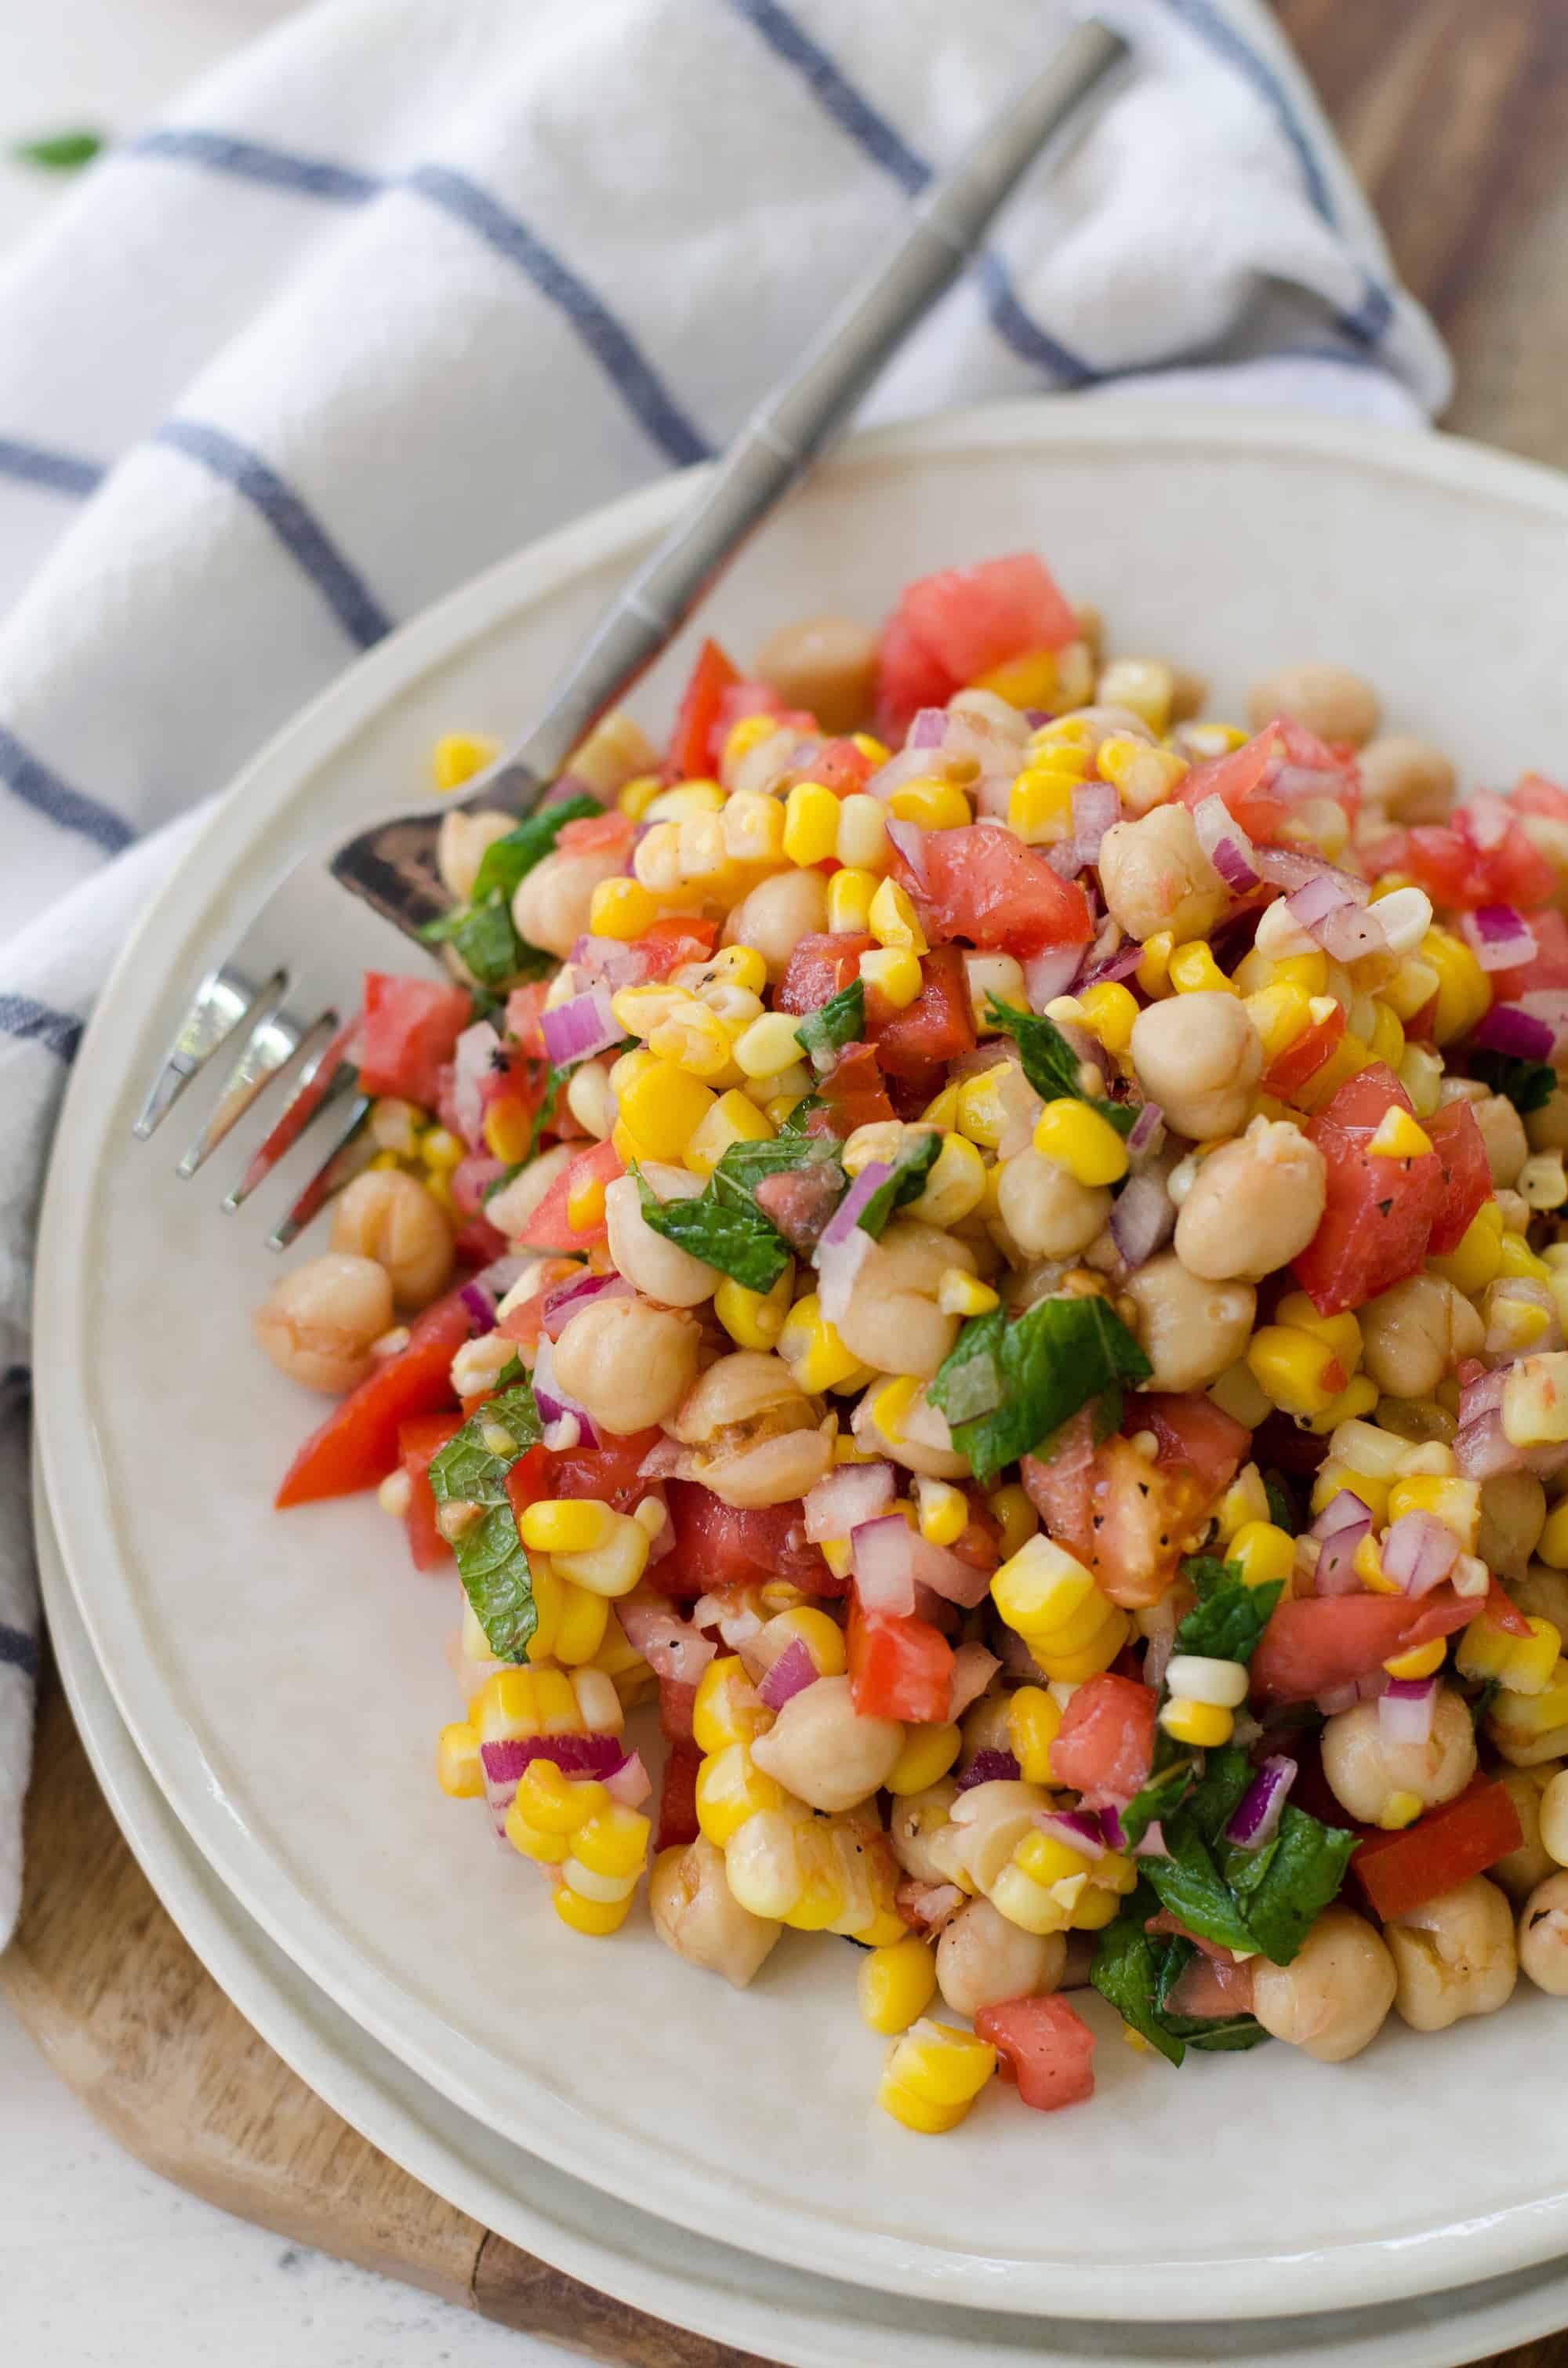 High Fiber Side Dishes  Corn Tomato and Mint Salad Delish Knowledge